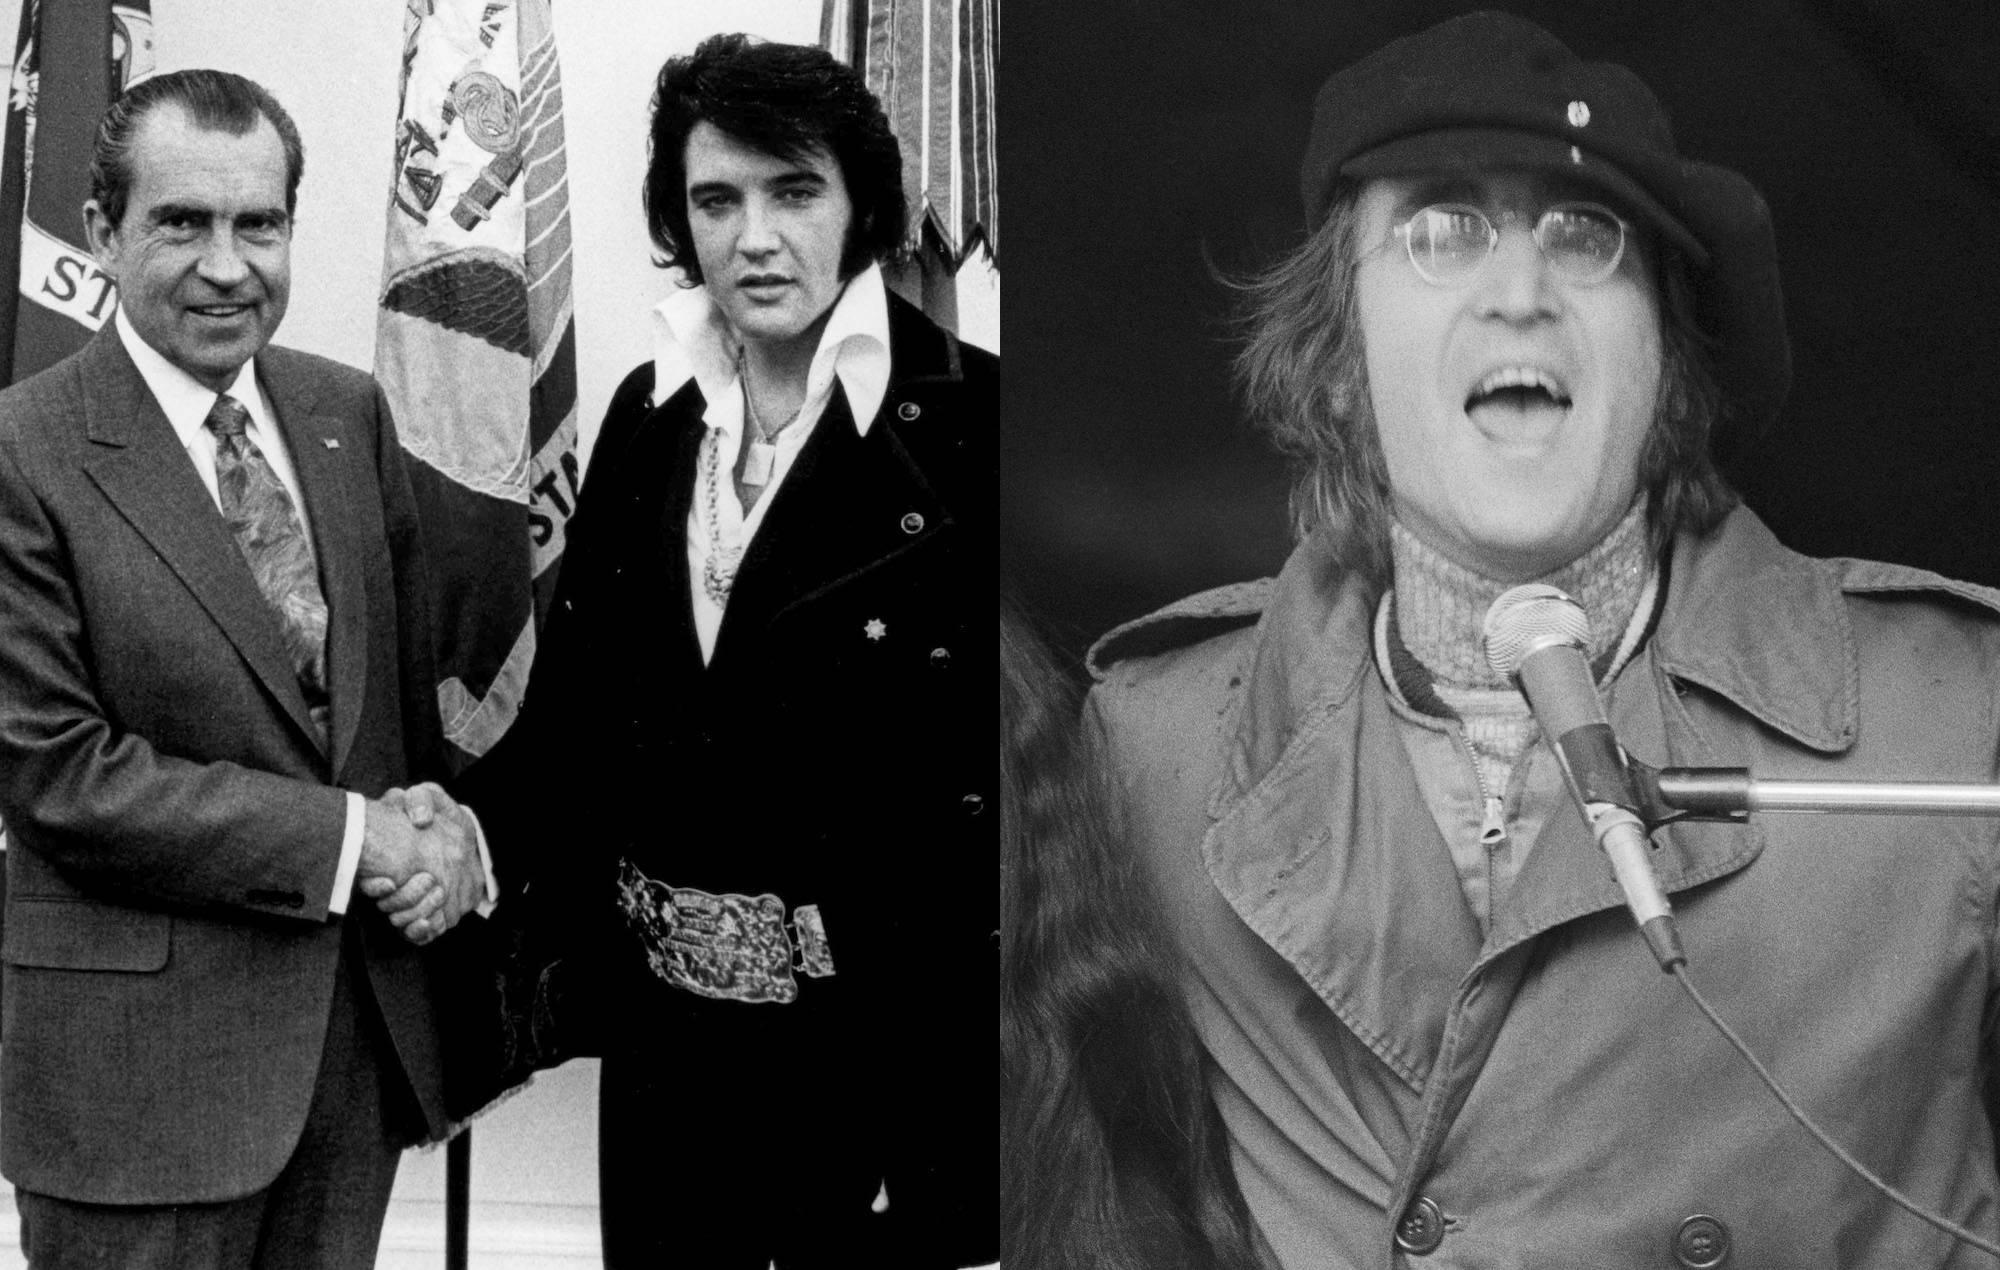 Bob Harris says Richard Nixon asked Elvis Presley to spy on John Lennon